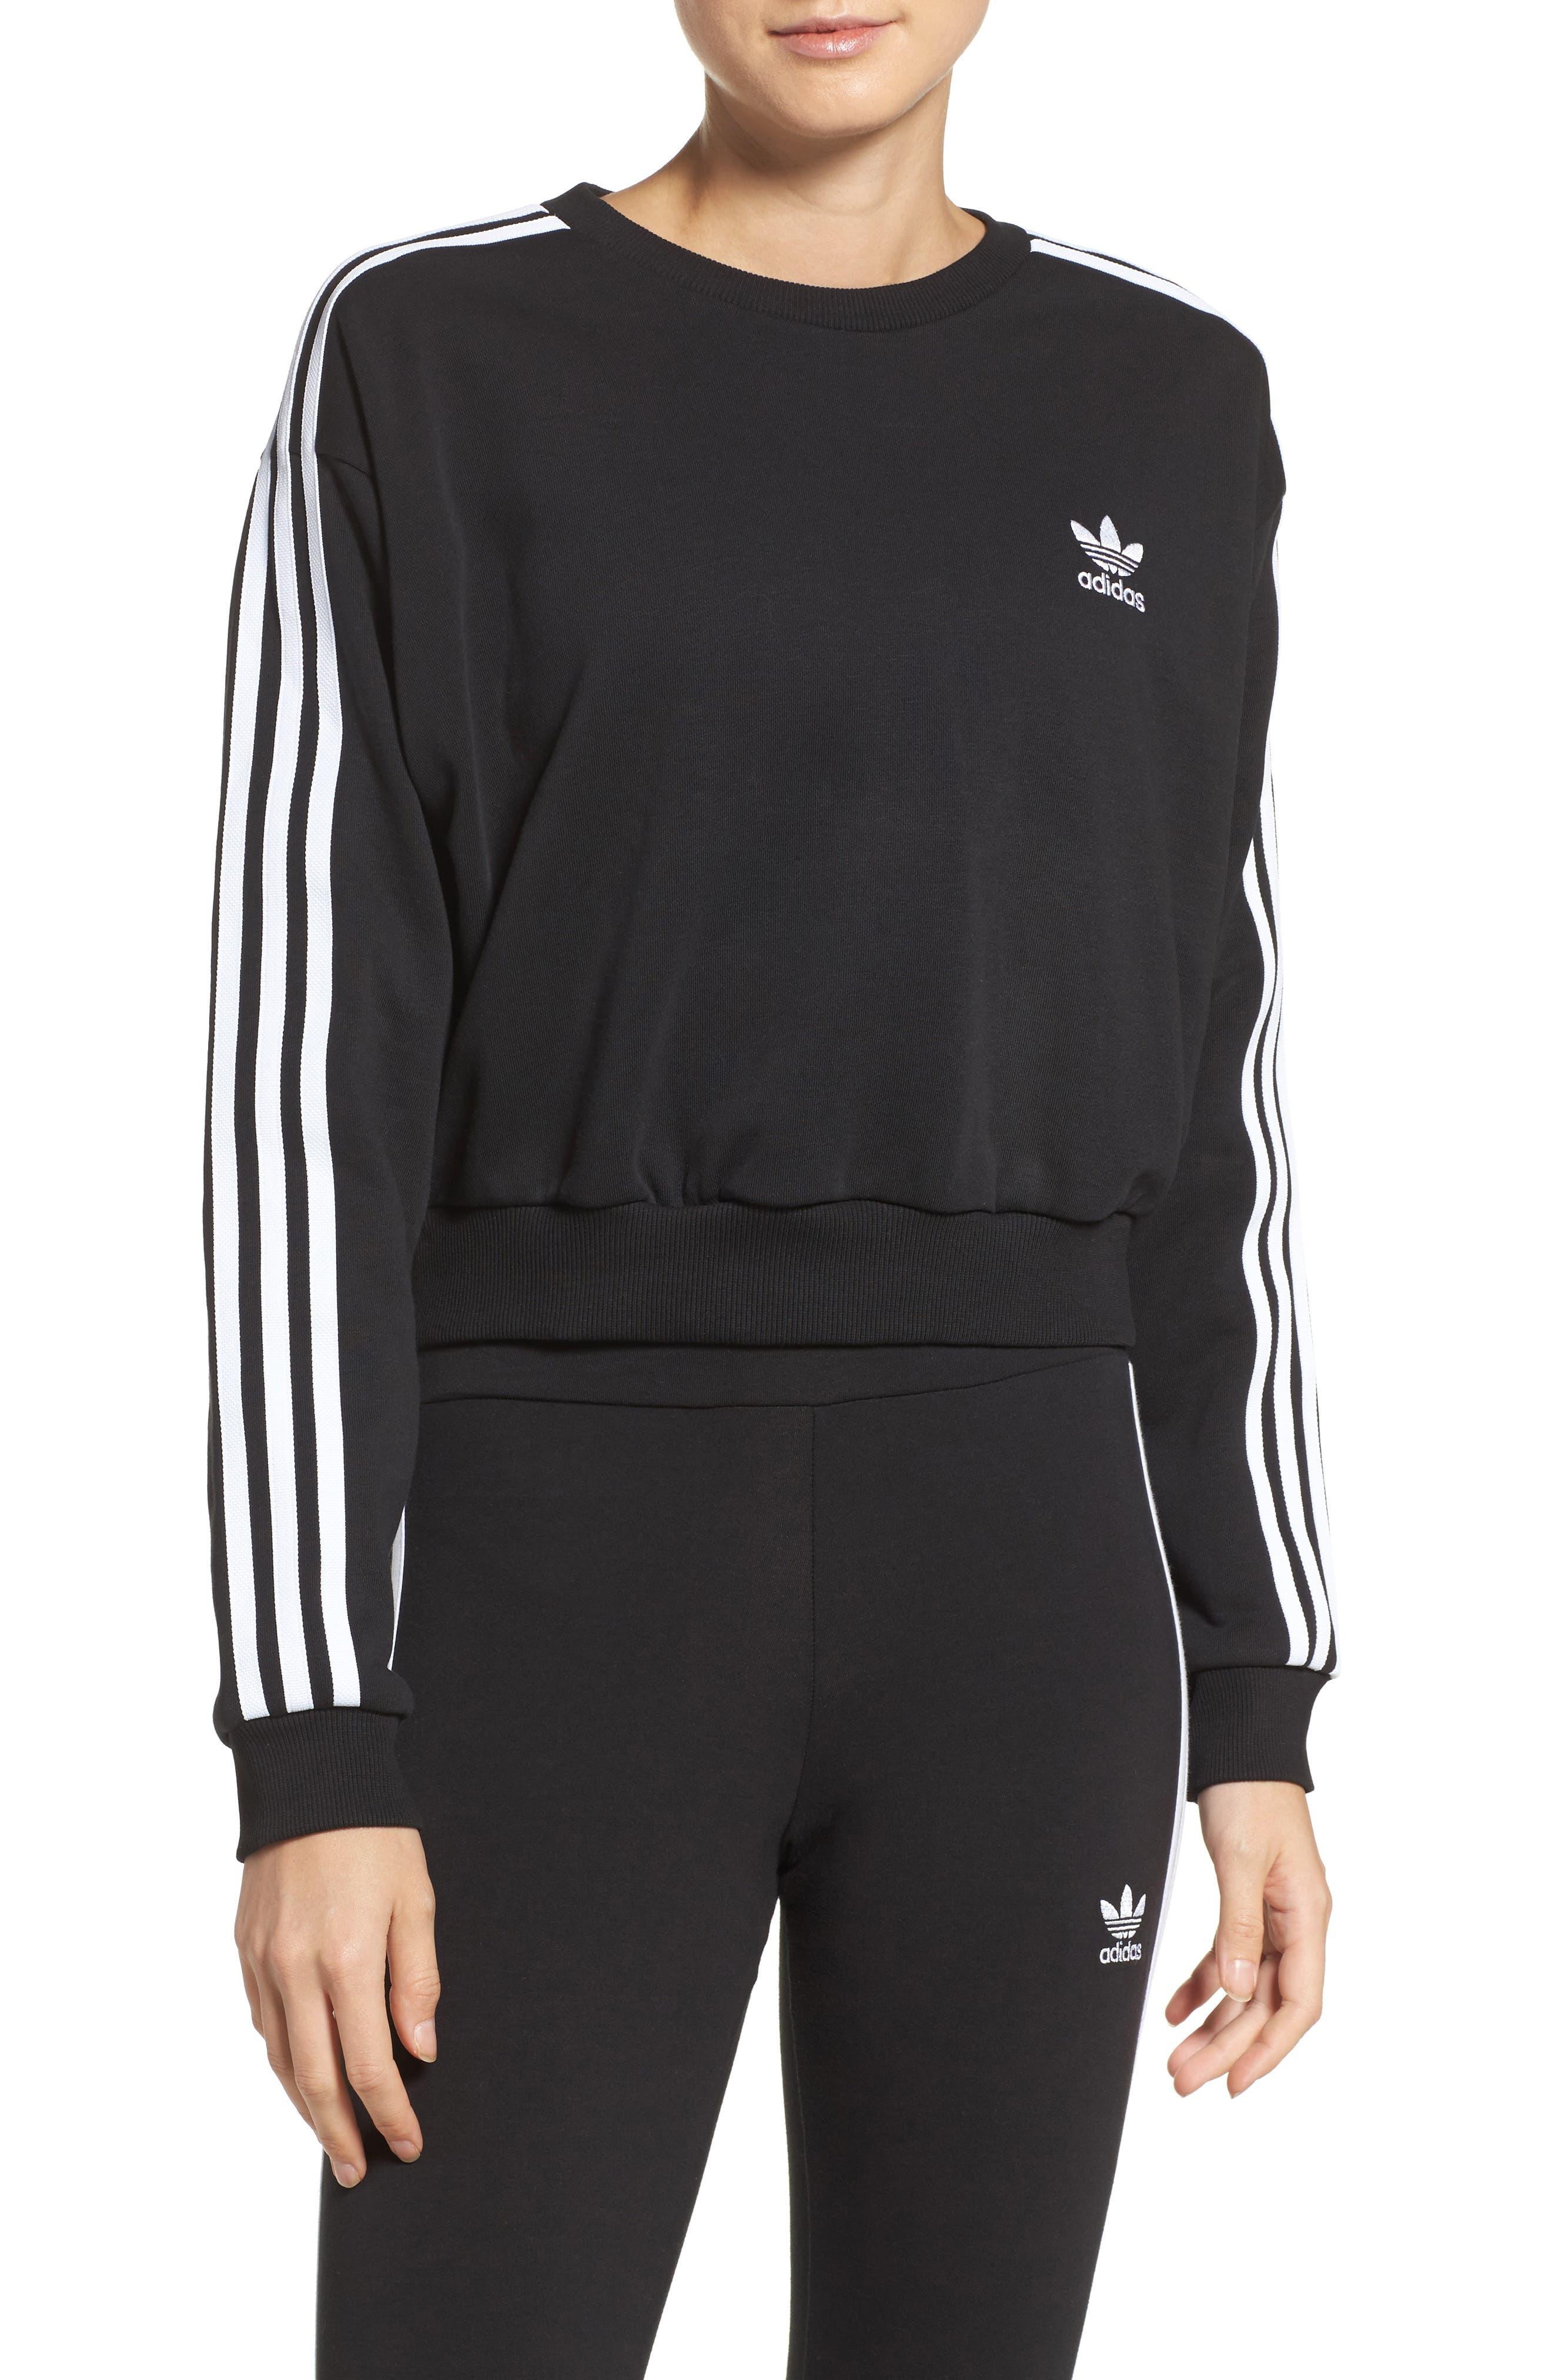 Main Image - adidas Originals 3-Stripes Crop Sweatshirt